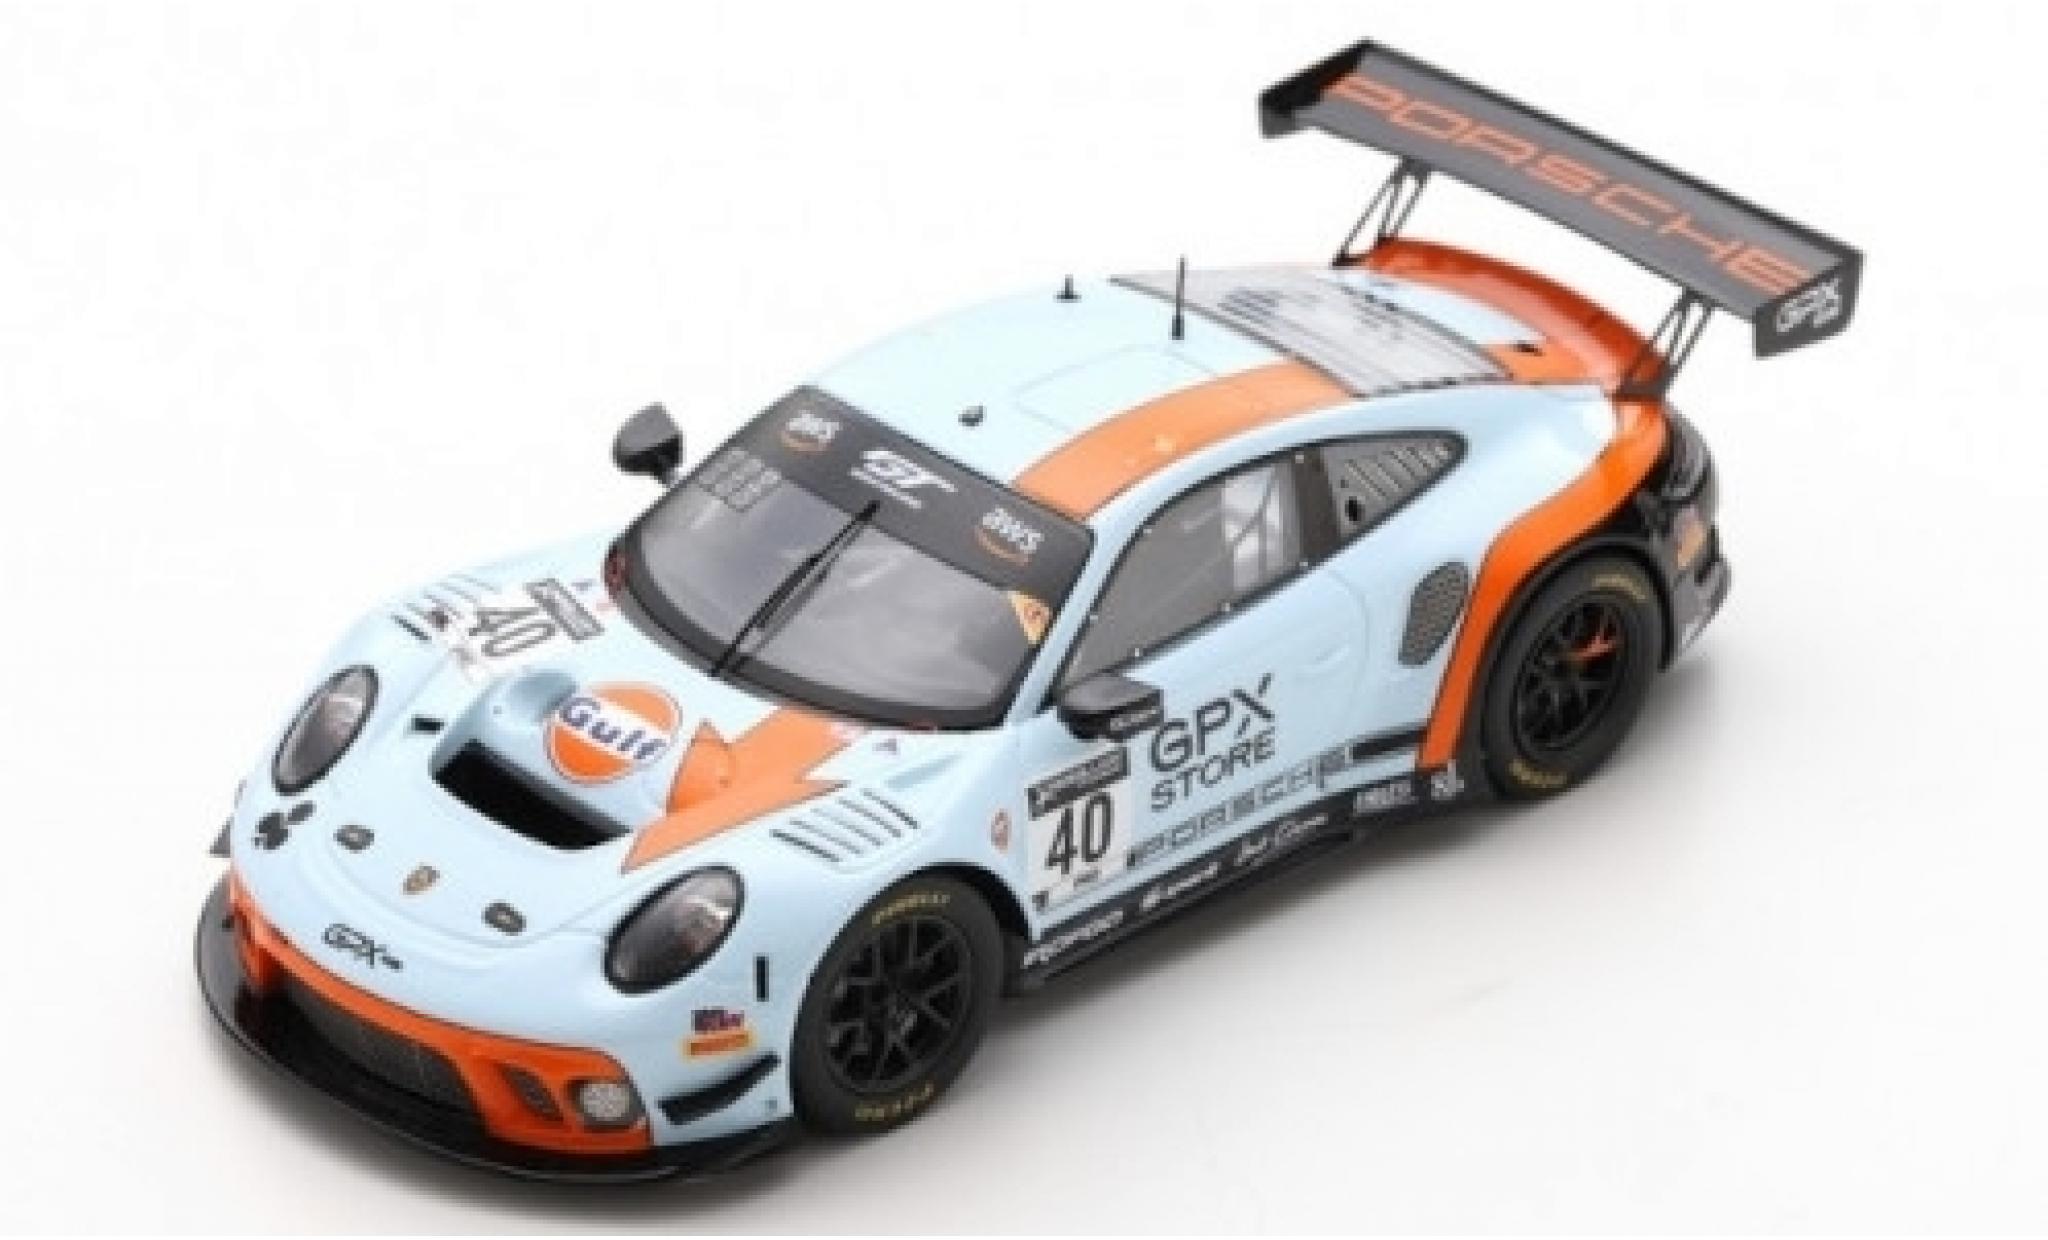 Porsche 992 GT3 R 1/43 Spark 911 (991.2) No.40 GPX Racing Gulf 2019 The Club